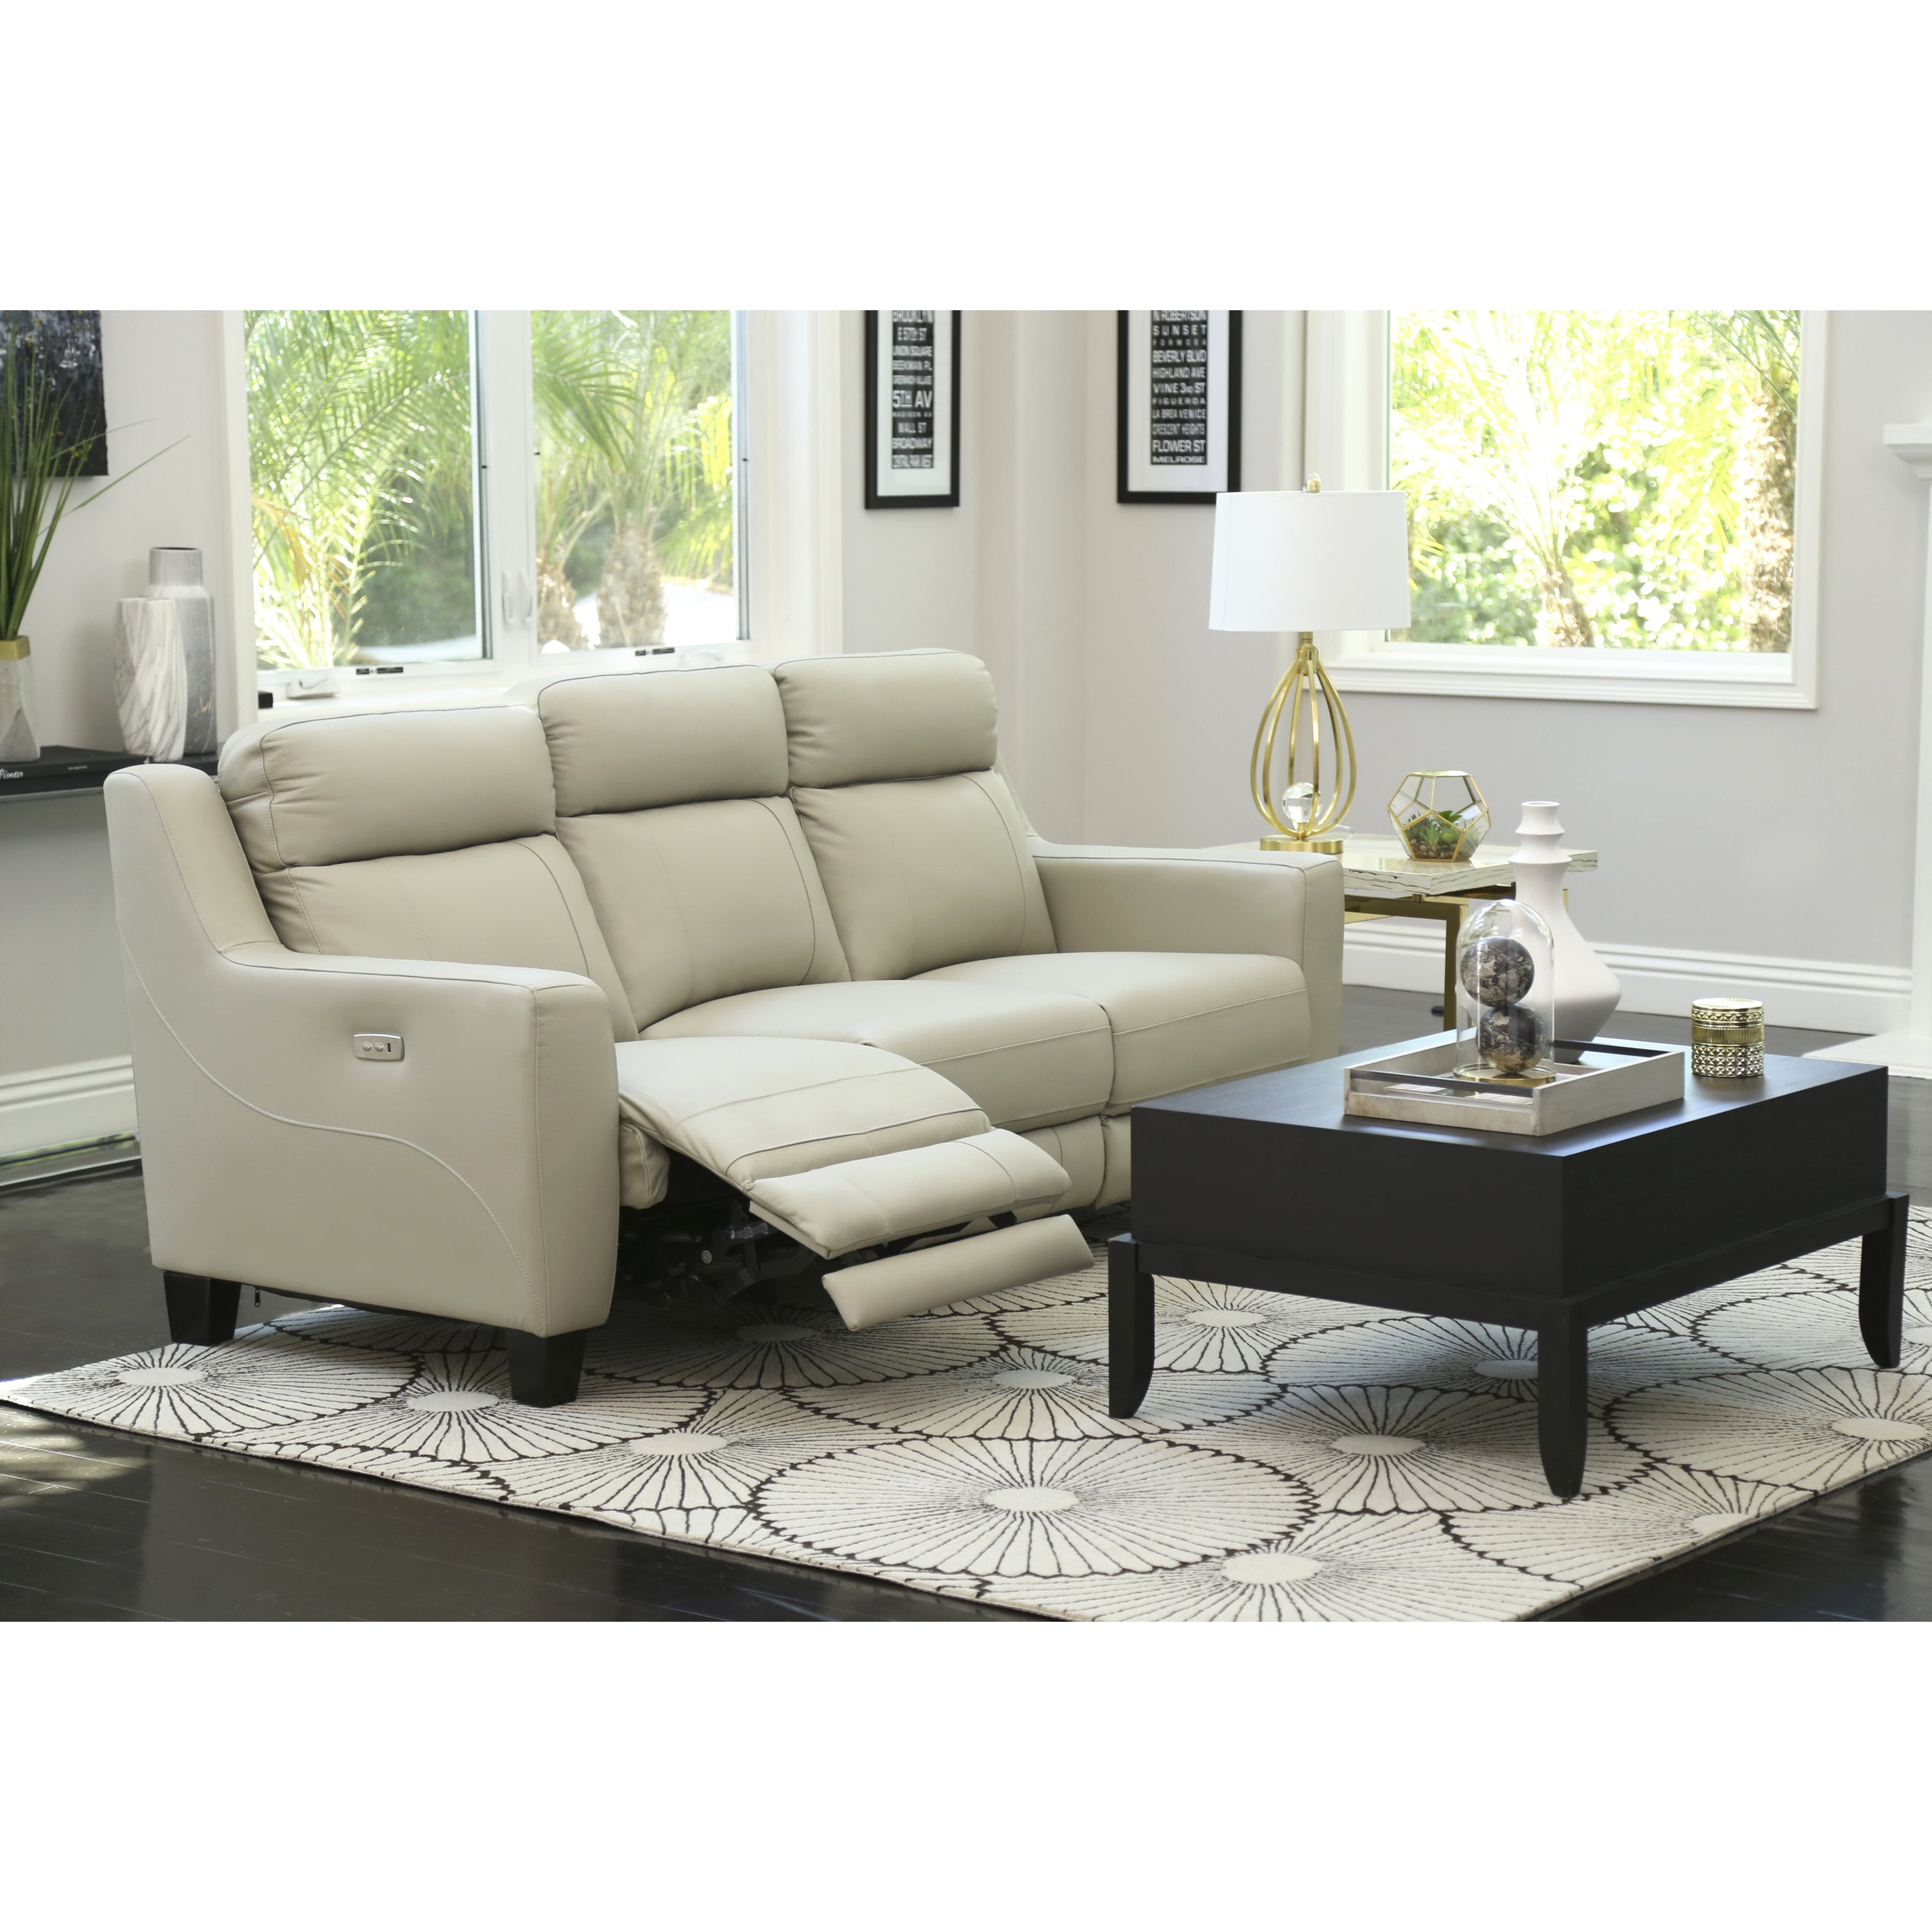 Abbyson Stanford Grey Leather Power Reclining Sofa